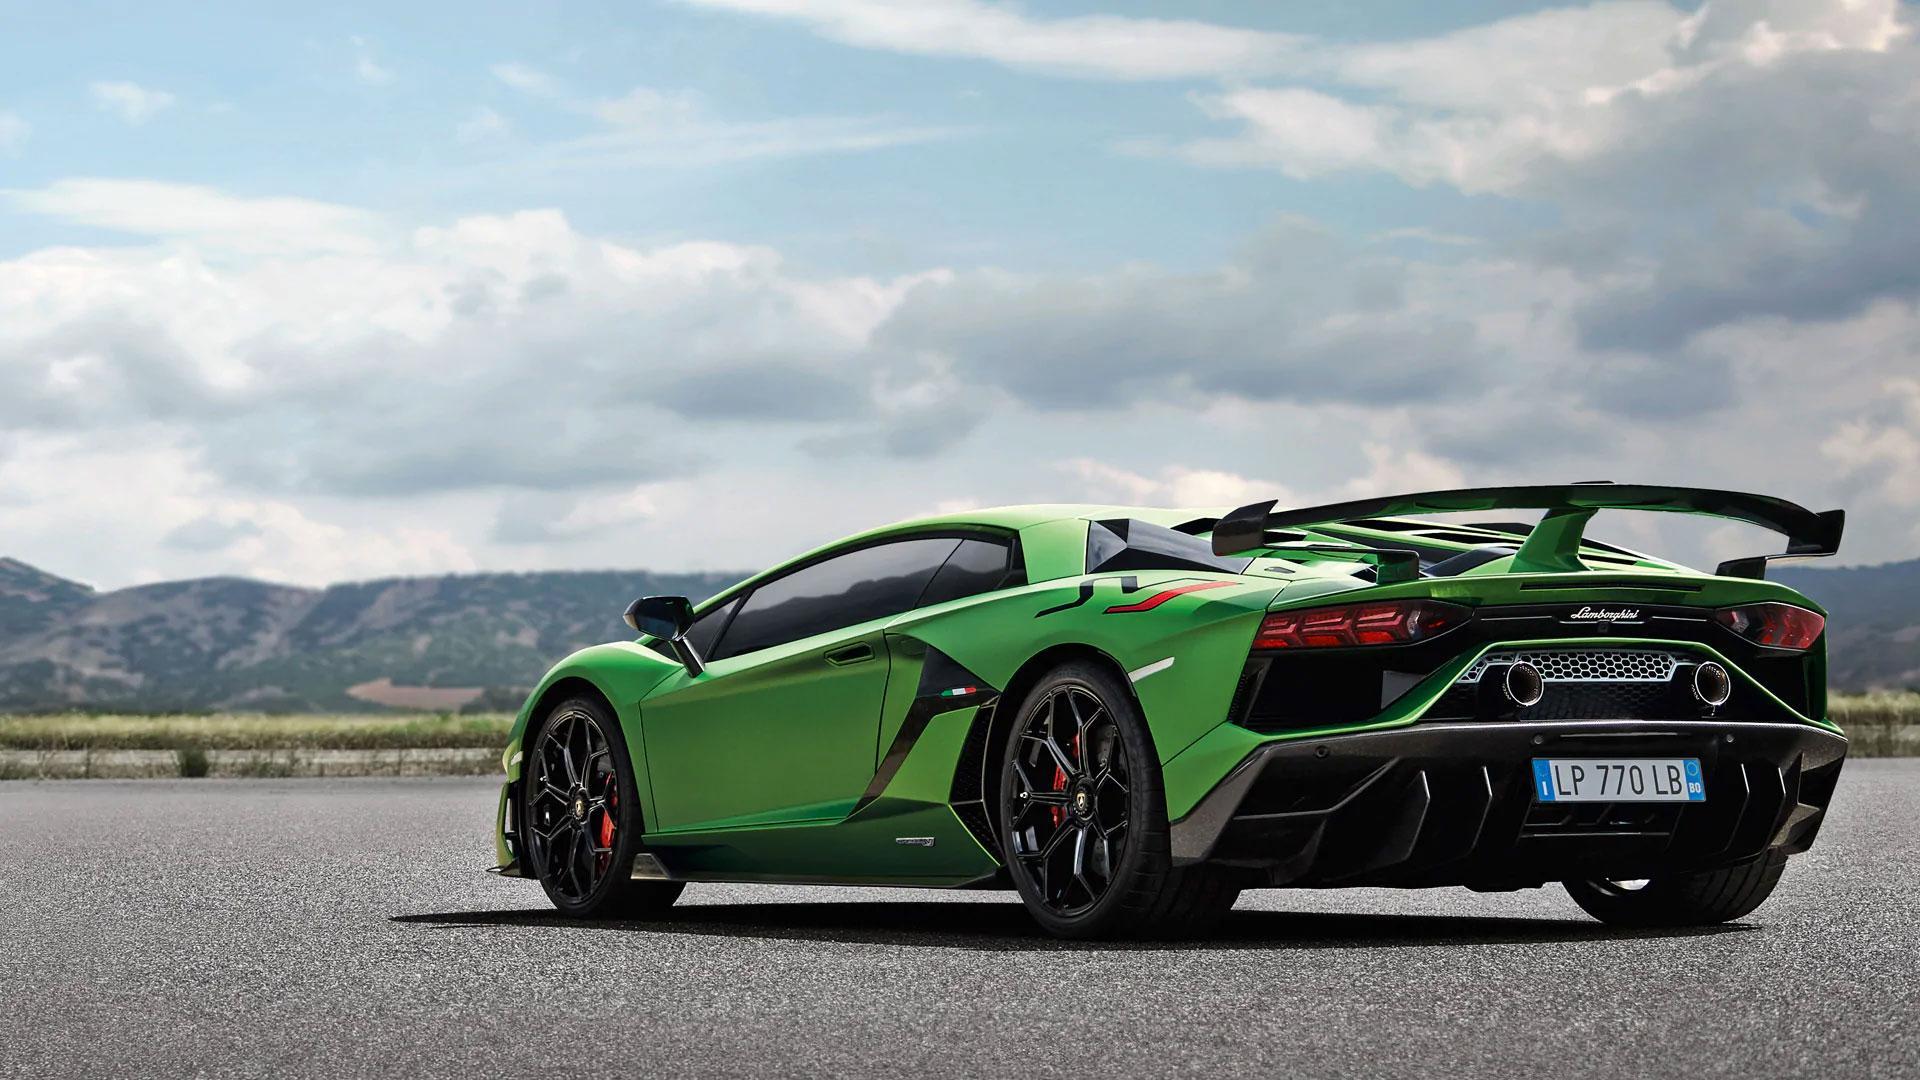 Lamborghini Aventador Svj Wallpapers Wallpaper Cave